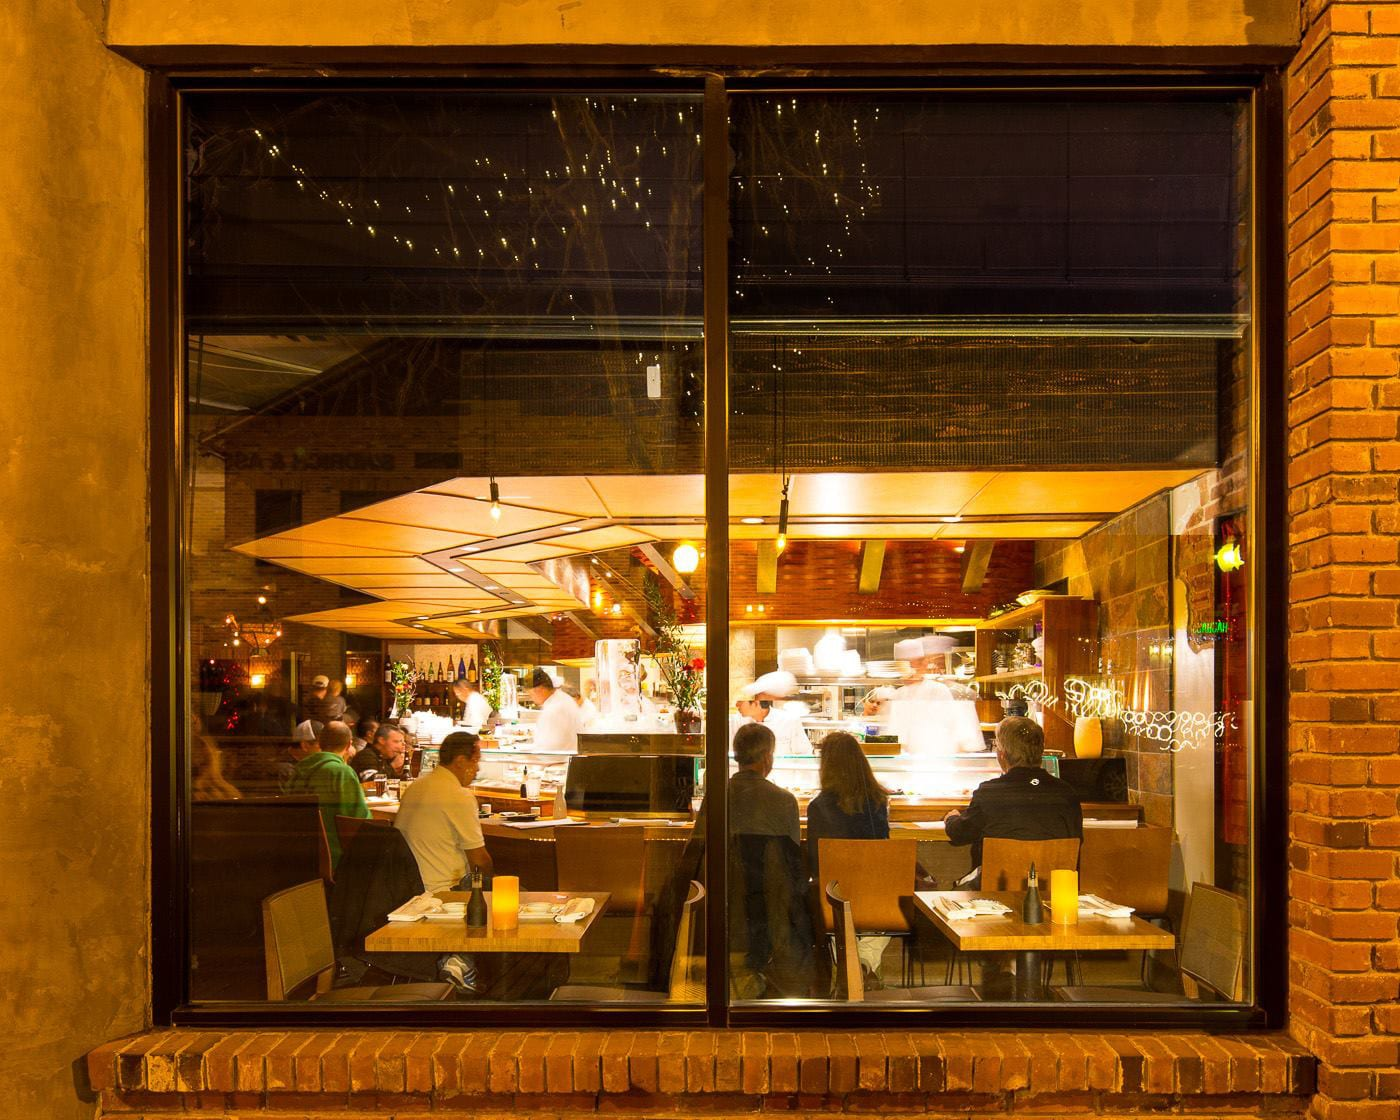 Sushi Den Tables Denver CO Looking Through Window